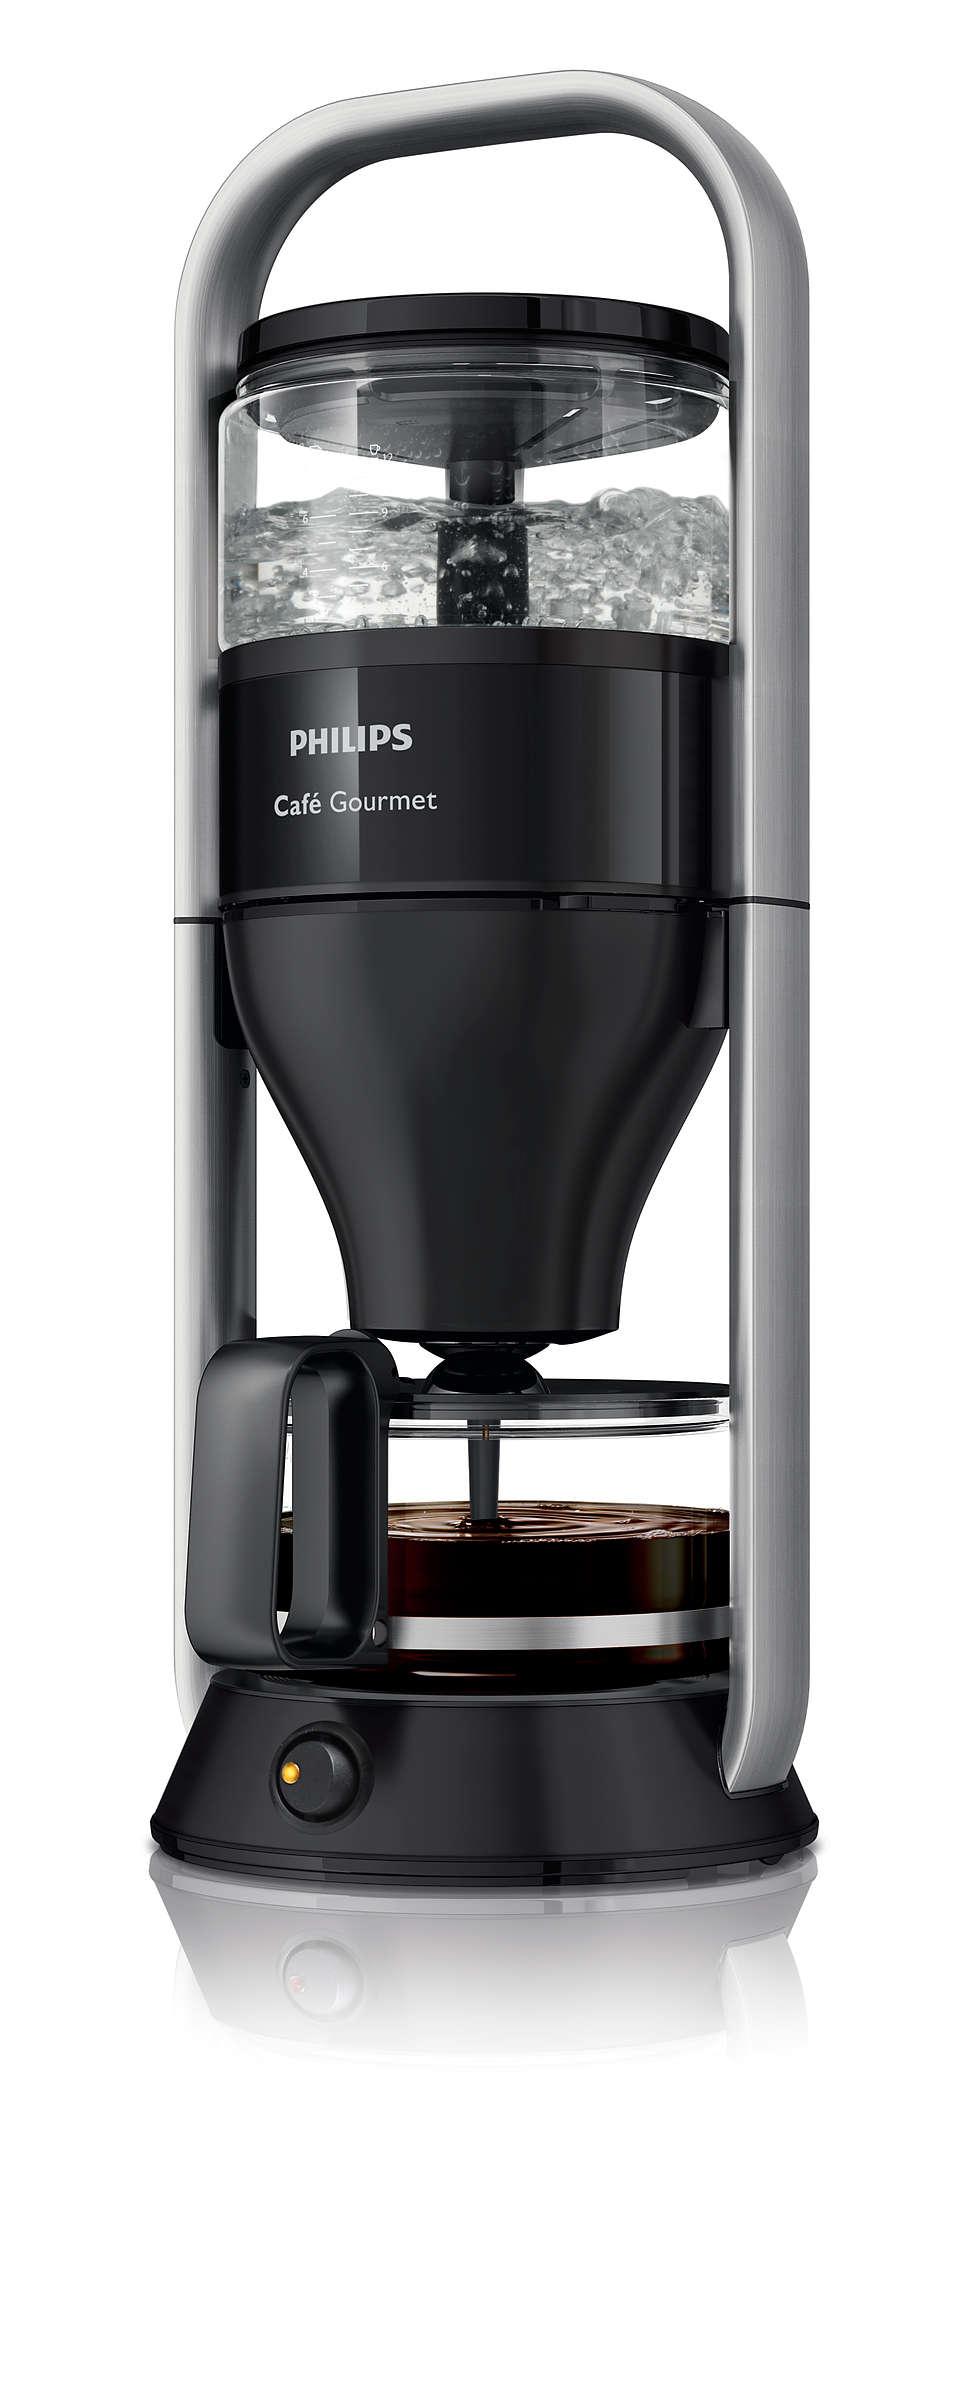 The taste of handmade filter coffee, since 1988